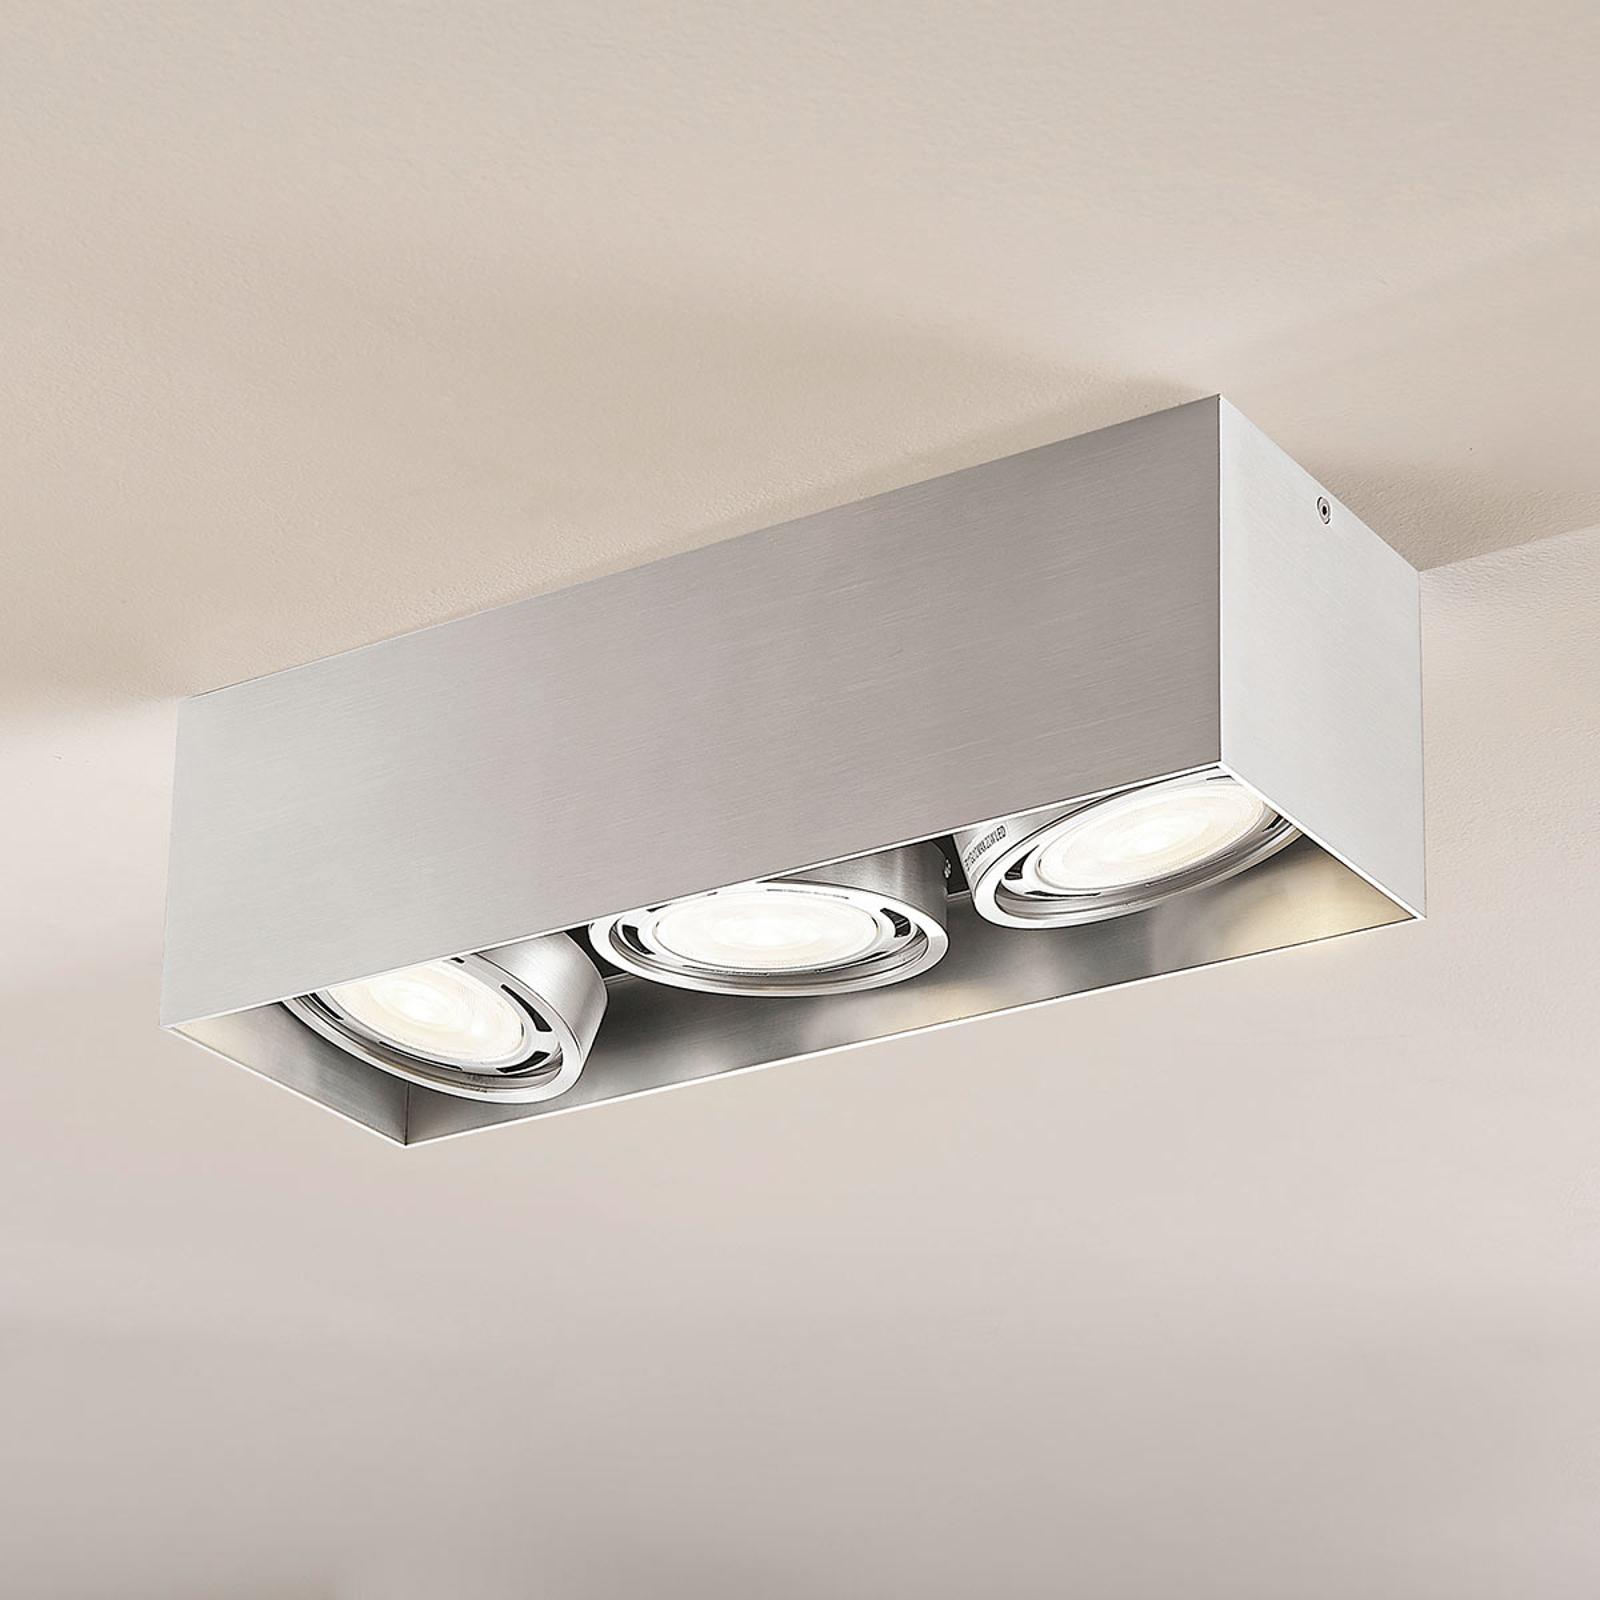 LED-Downlight Rosalie, dimmbar, eckig, 3-fl., alu